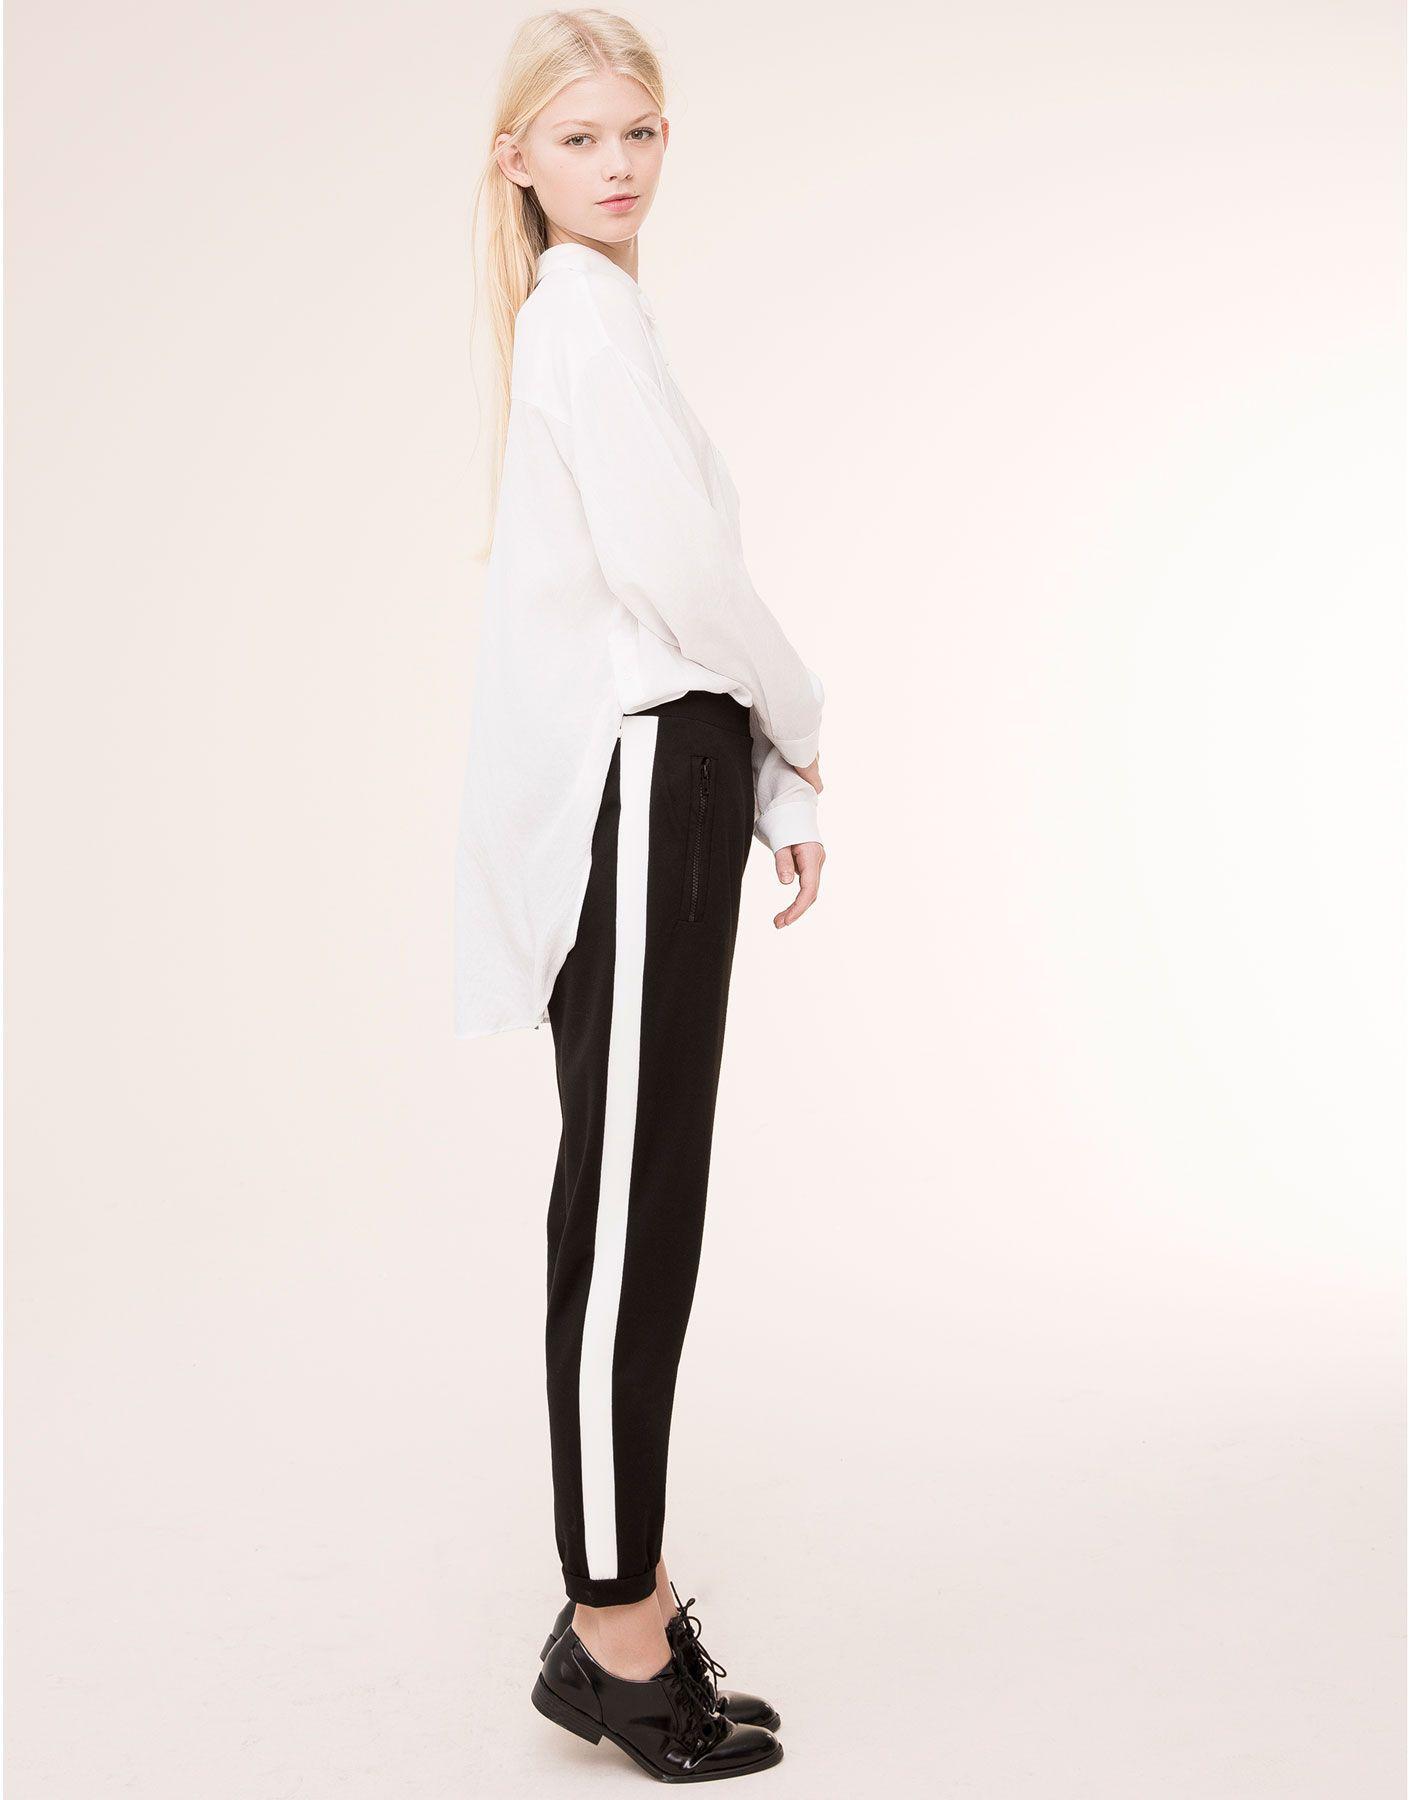 pantalon sport bande c t pantalons femme pull bear france noir et blanc black white. Black Bedroom Furniture Sets. Home Design Ideas